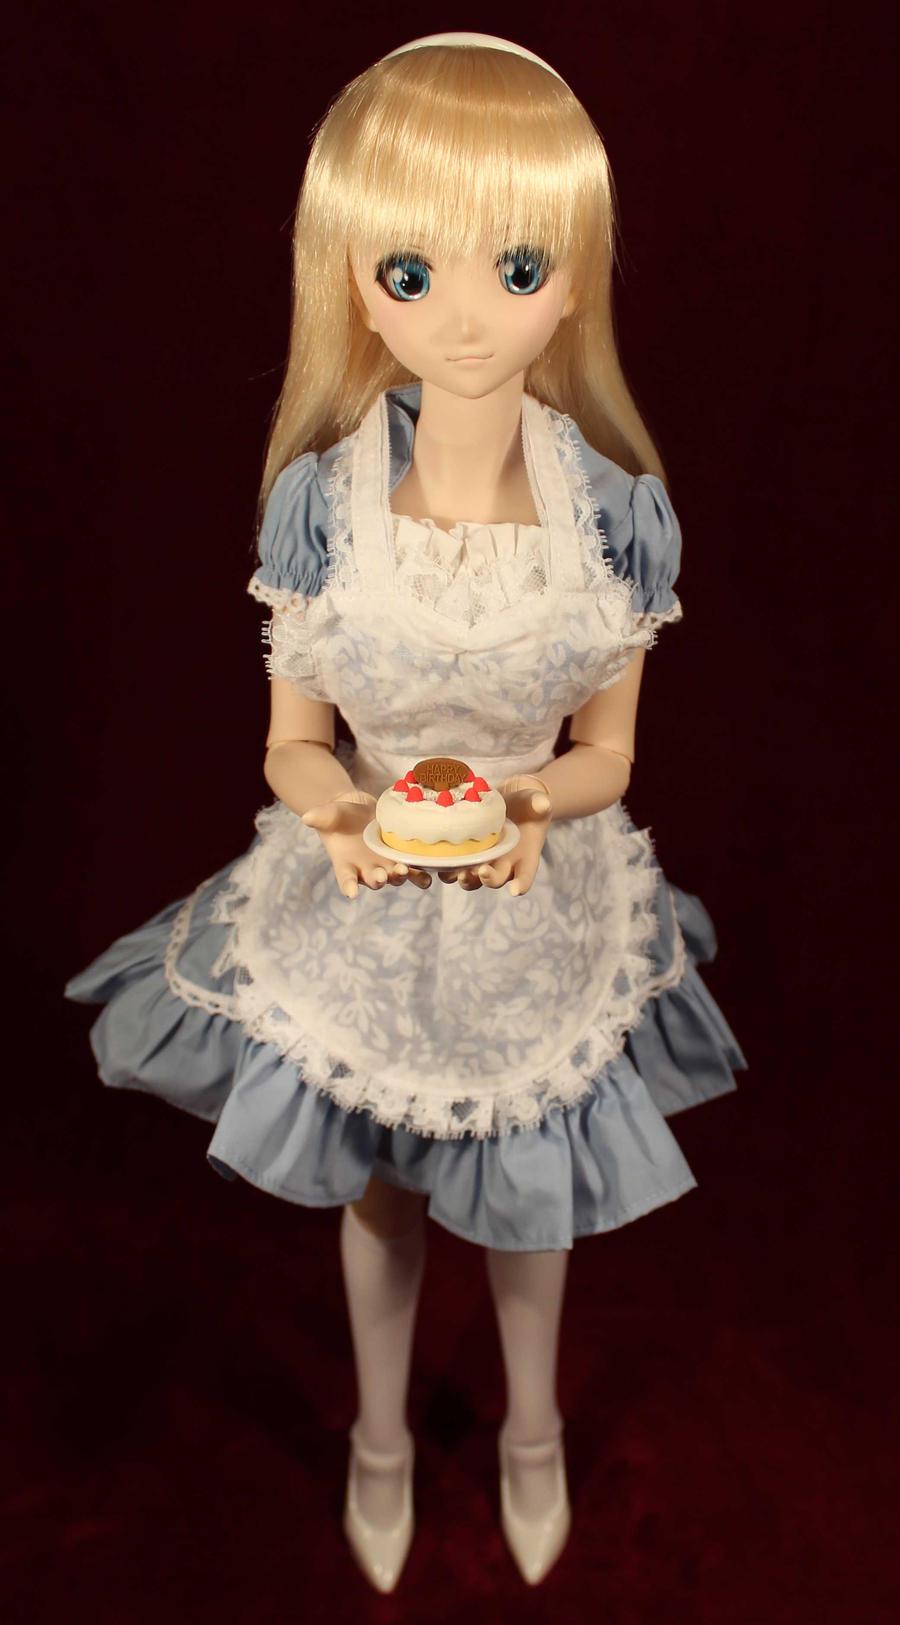 Happy Birthday Maid 1 by AnimatorAR